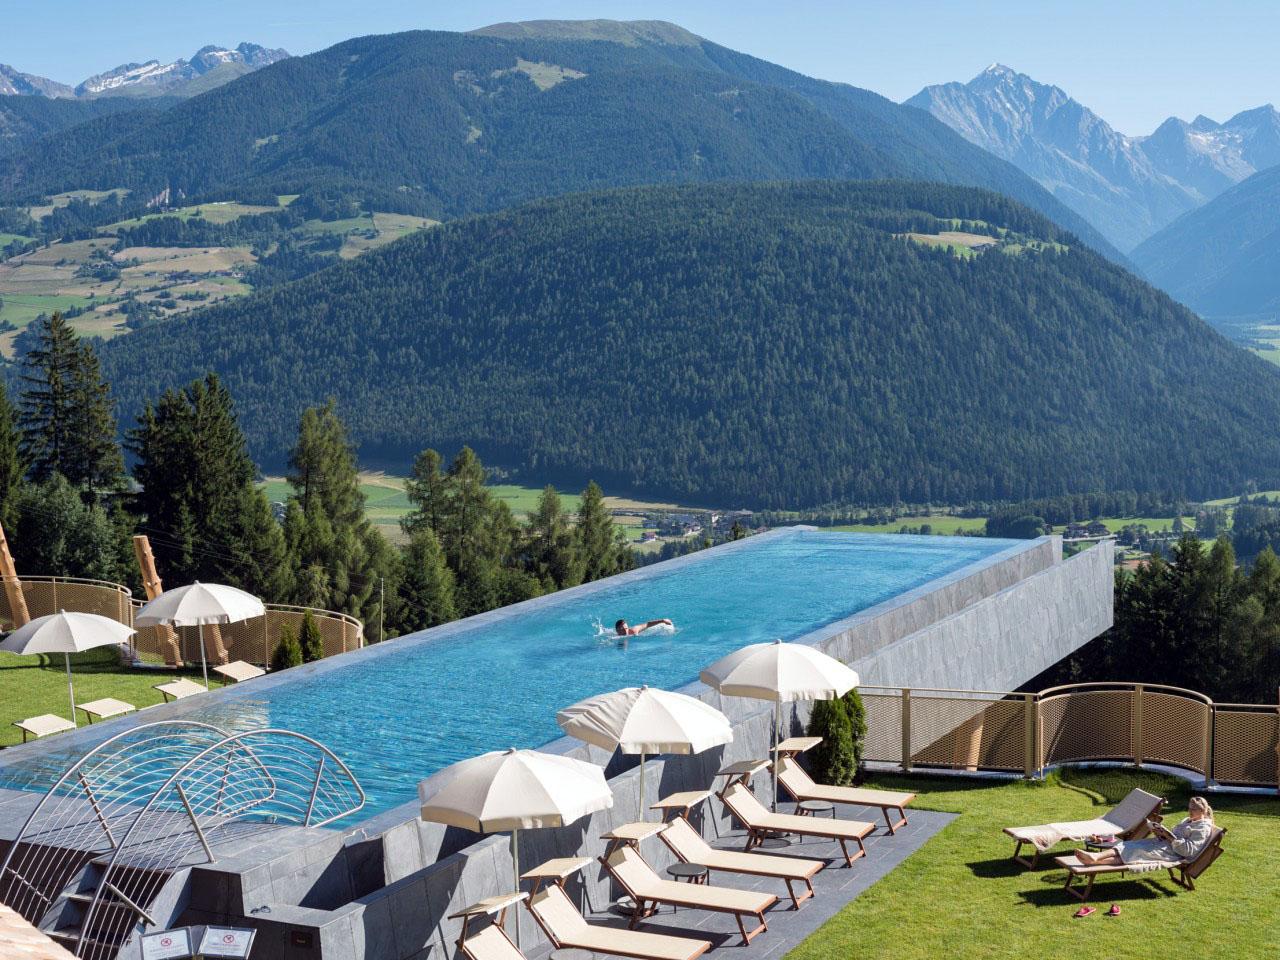 Descubre tu mundo el descanso so ado hotel hubertus dolomitas italia destino - Piscina hotel hubertus ...